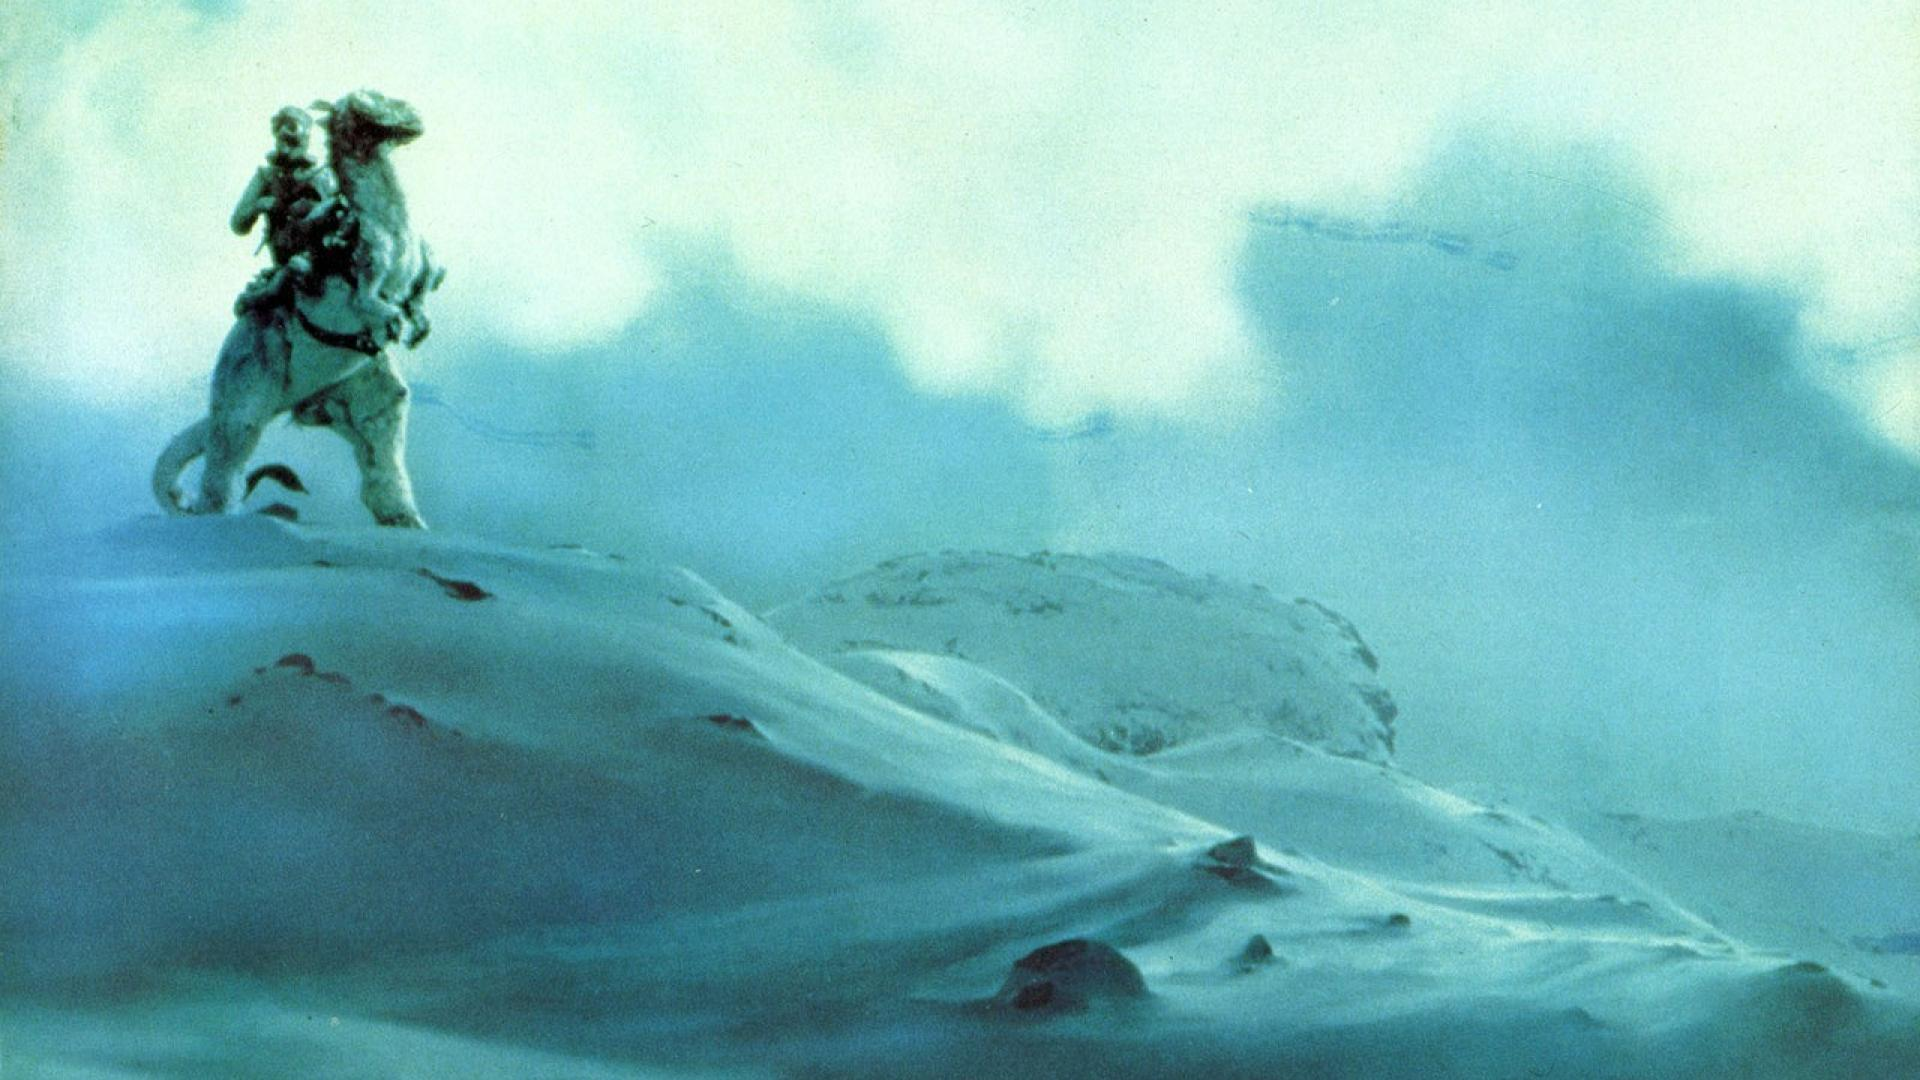 Hoth luke skywalker star wars landscapes movies wallpaper 60561 1920x1080